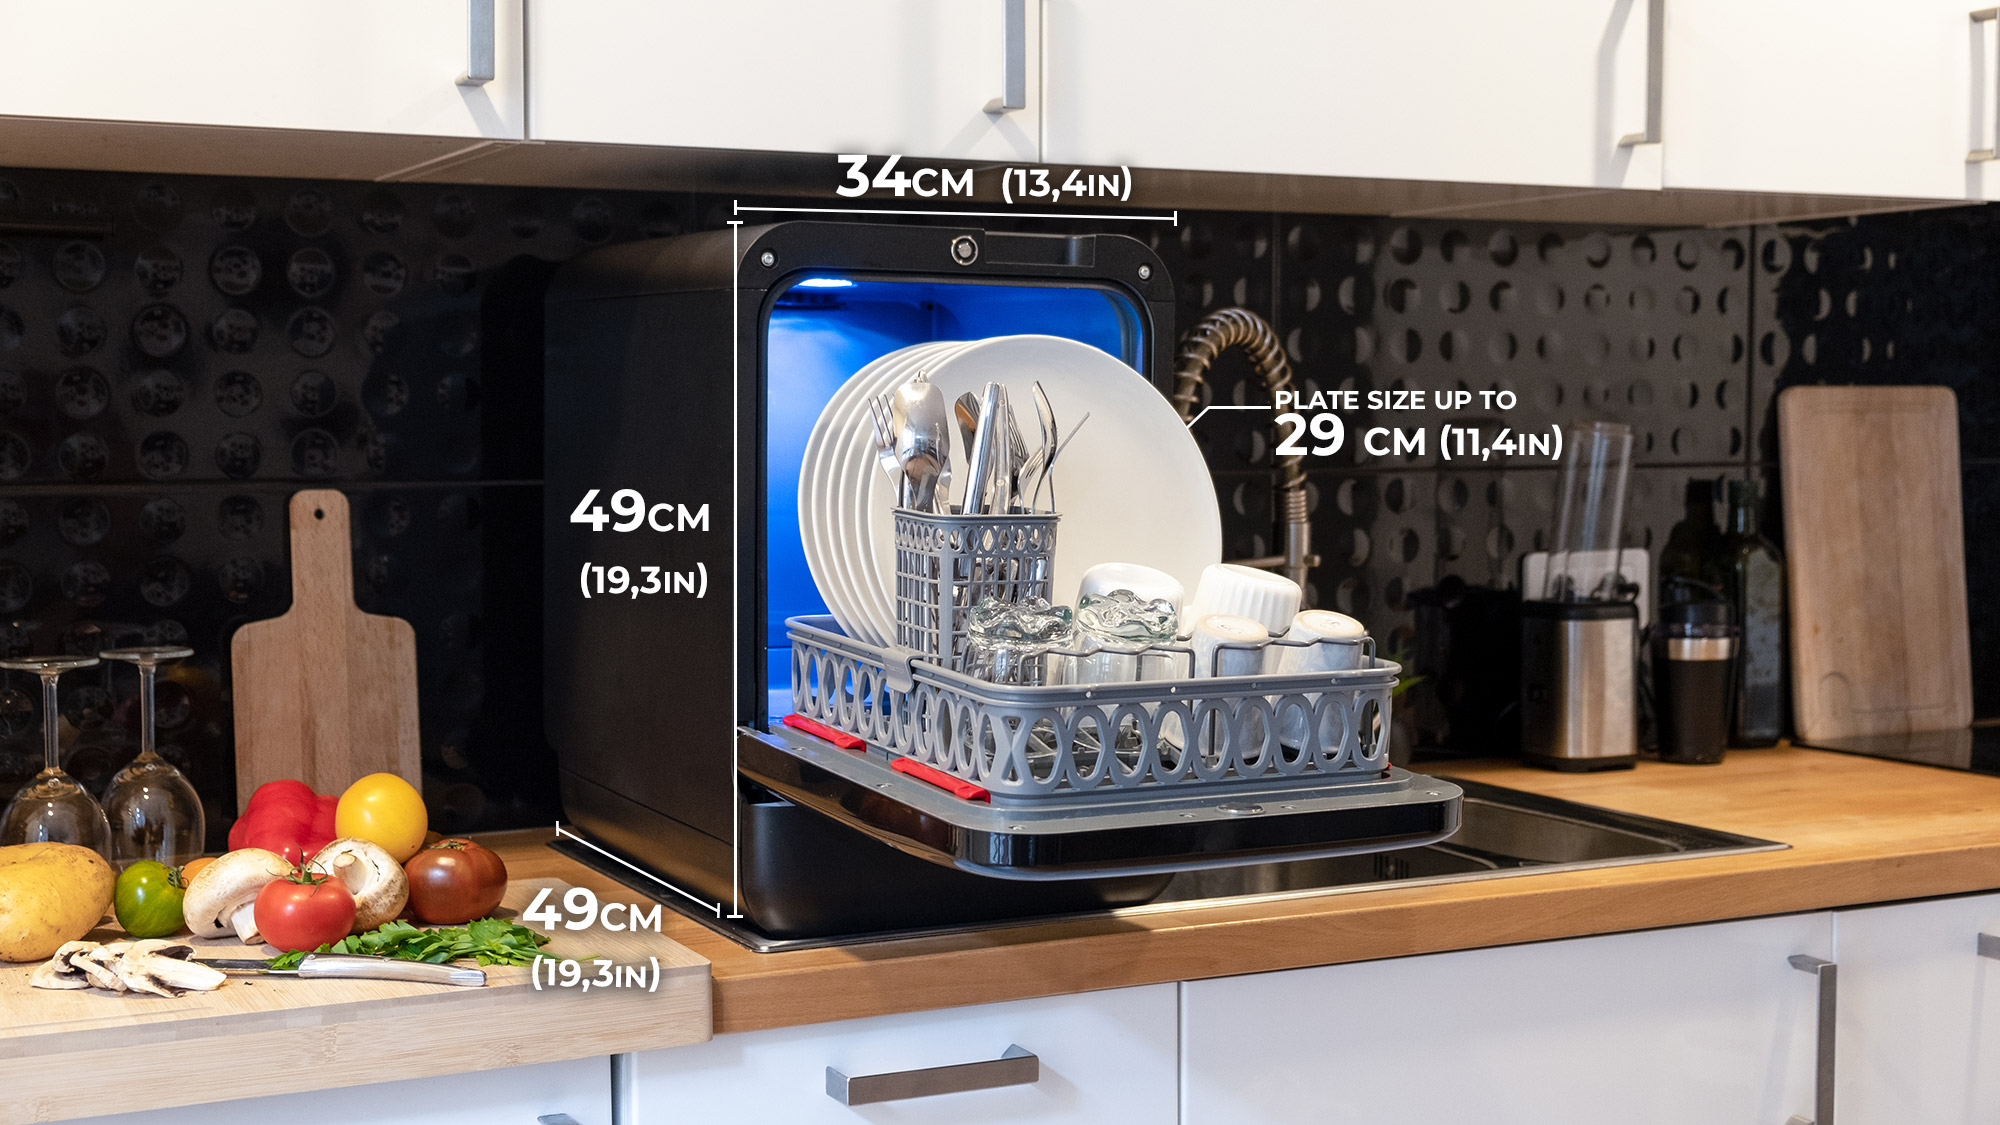 Dimension ok Bob the mini dishwasher